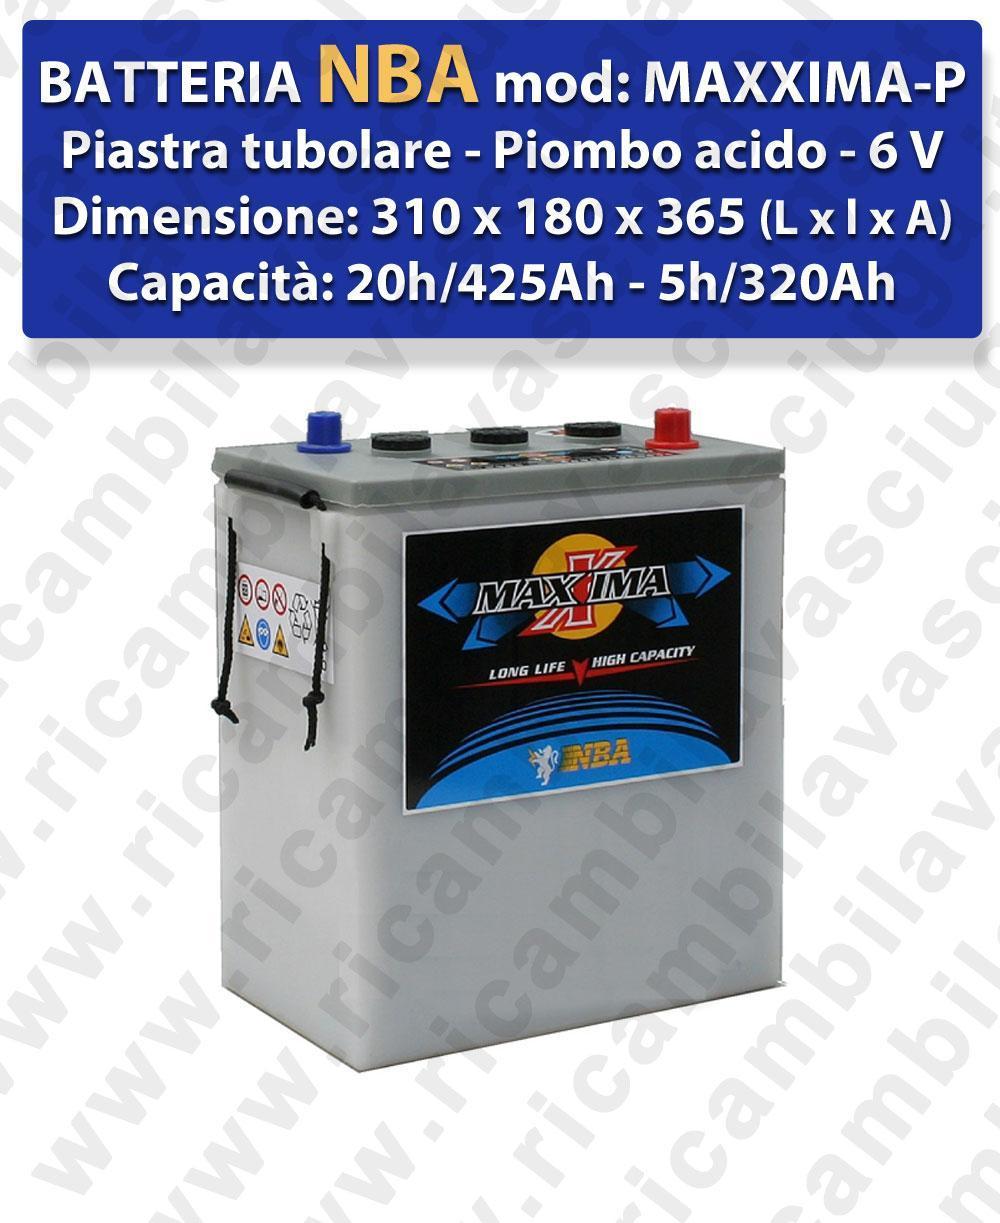 MAXXIMA-PLUS Blei Batterie 6V 425Ah 20/h NBA